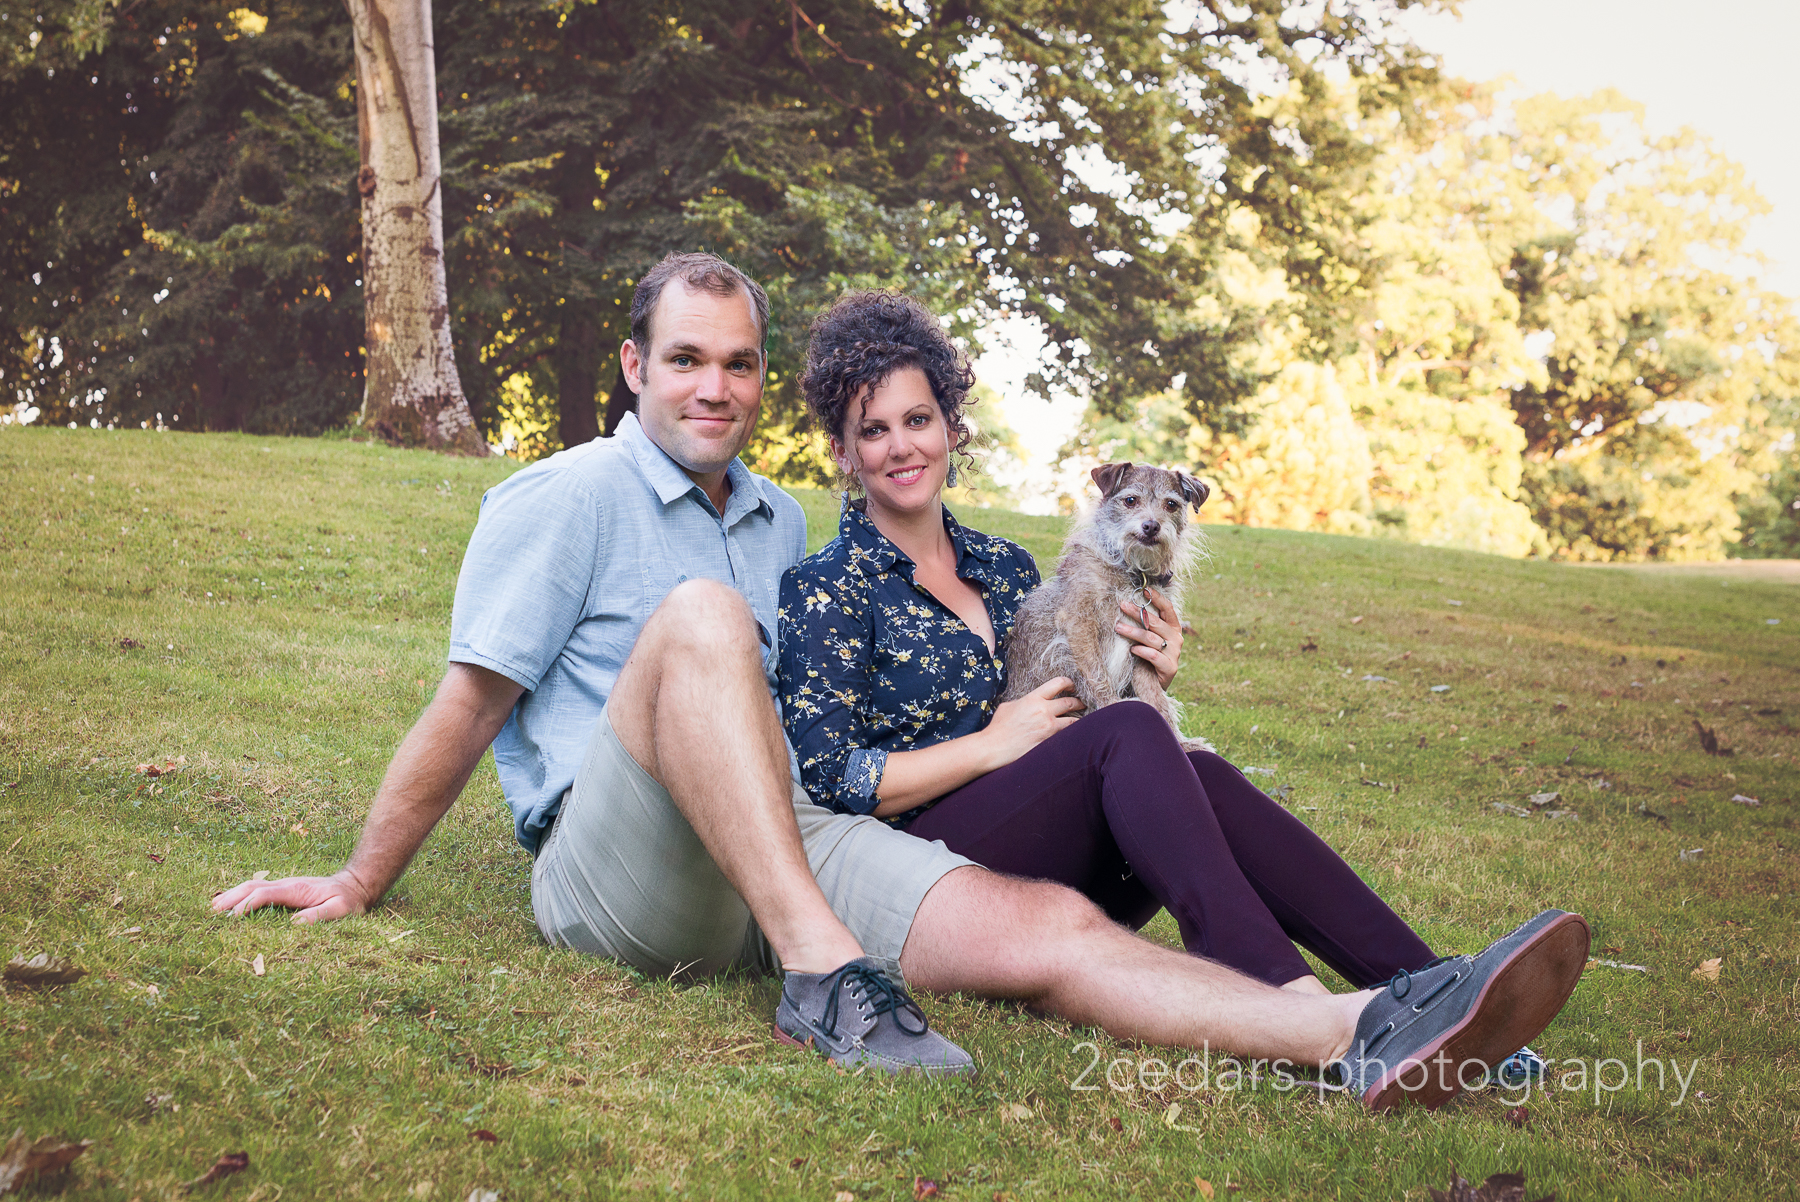 2cedarsphoto-Sullivan-Family-Web--6.jpg